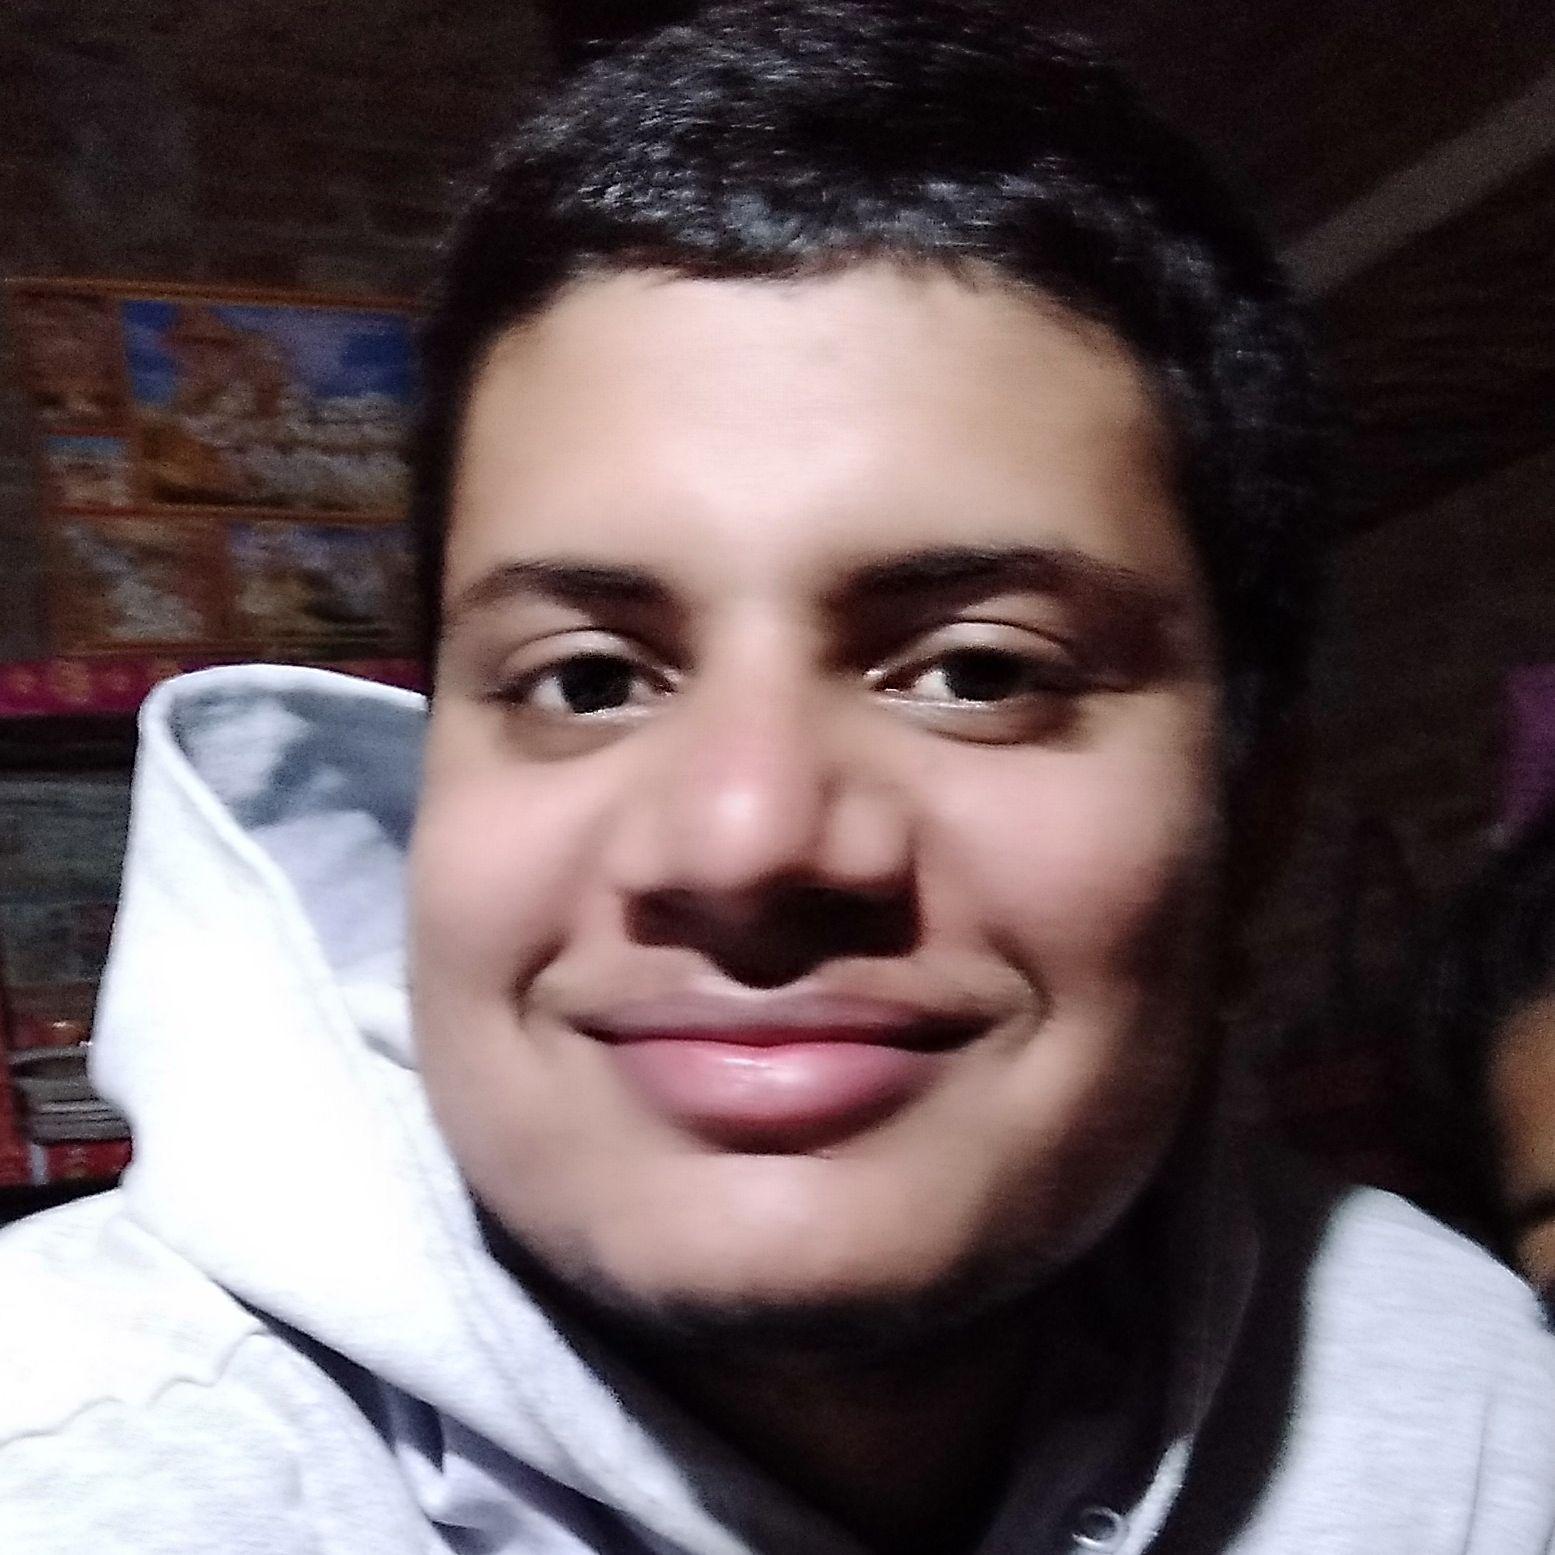 Vinay Pratap Singh